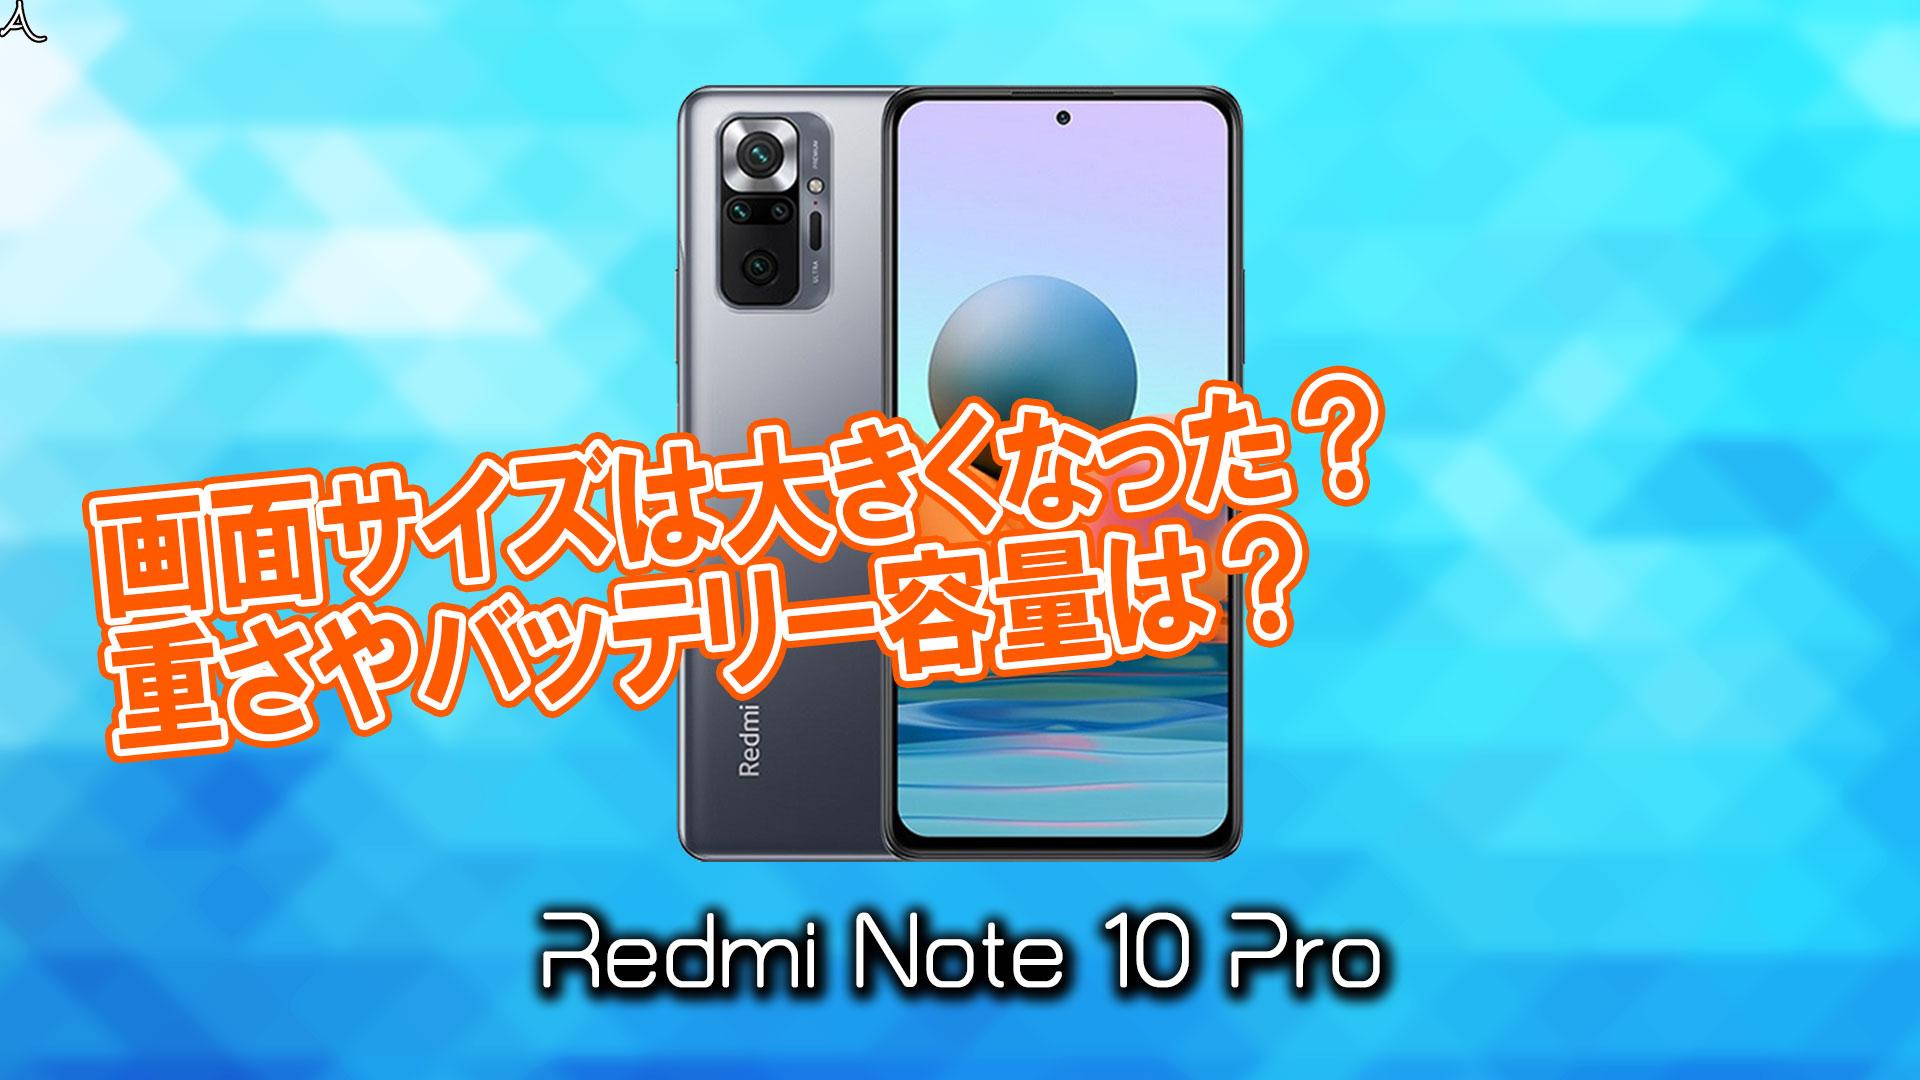 「Xiaomi Redmi Note 10 Pro」のサイズや重さを他のスマホと細かく比較